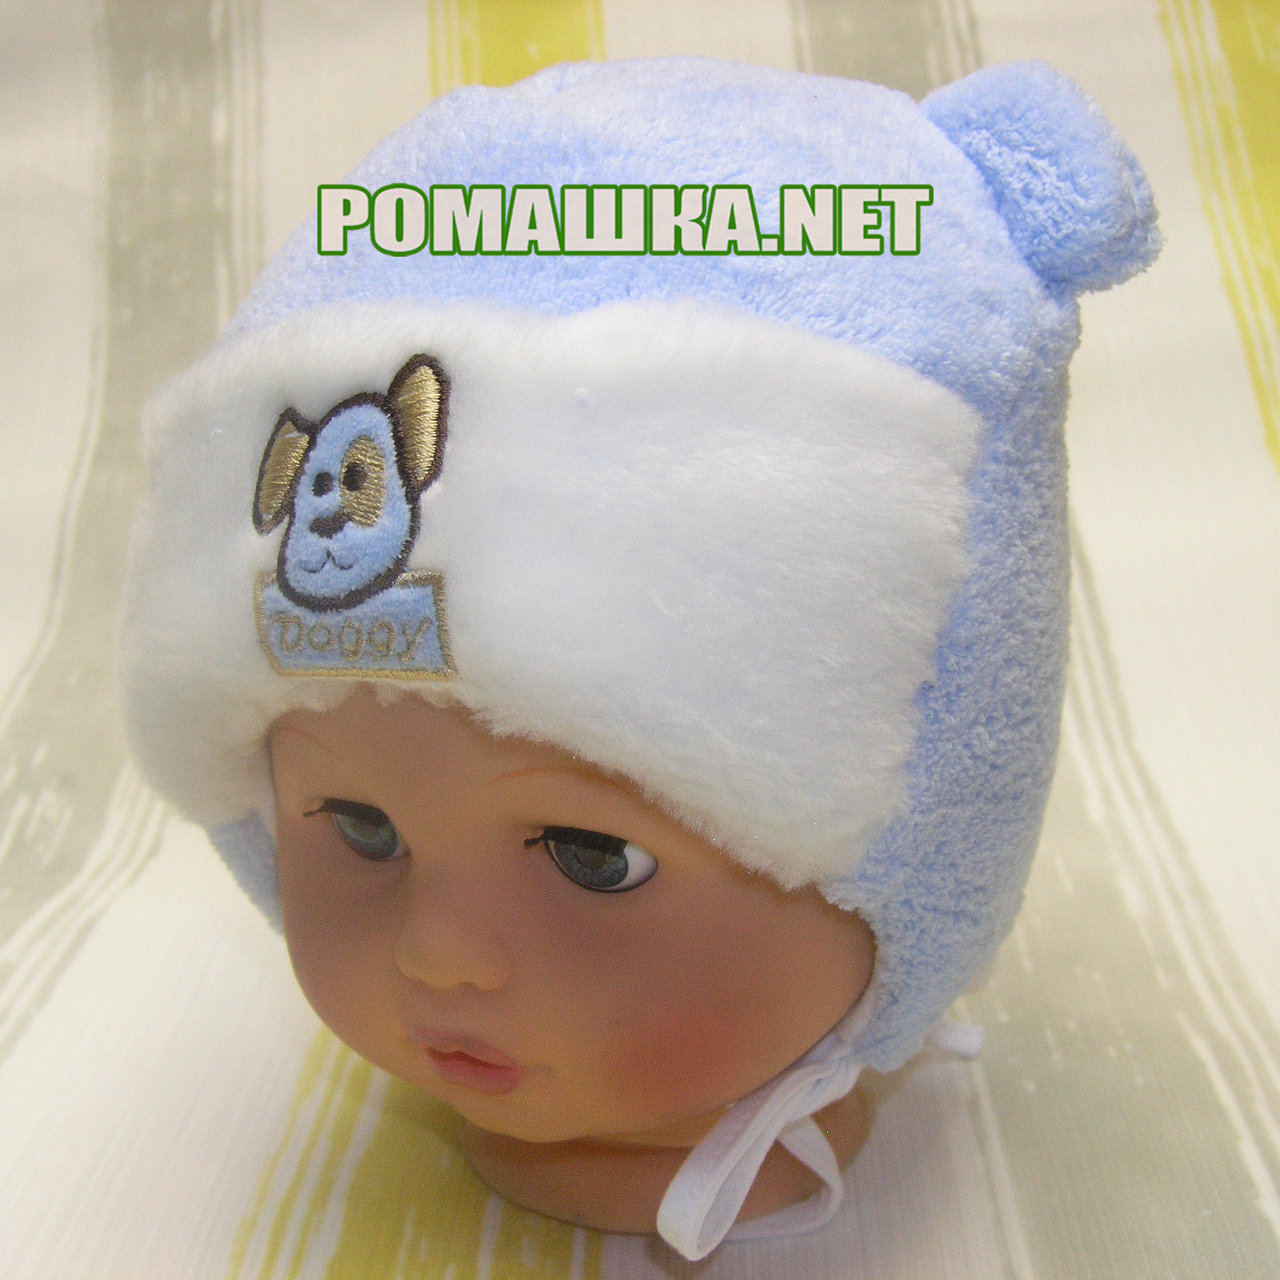 Детская зимняя термо шапочка на завязках р. 44 для новорожденного ТМ Мамина  мода 3206 Голубой b0452cfcf2d9b